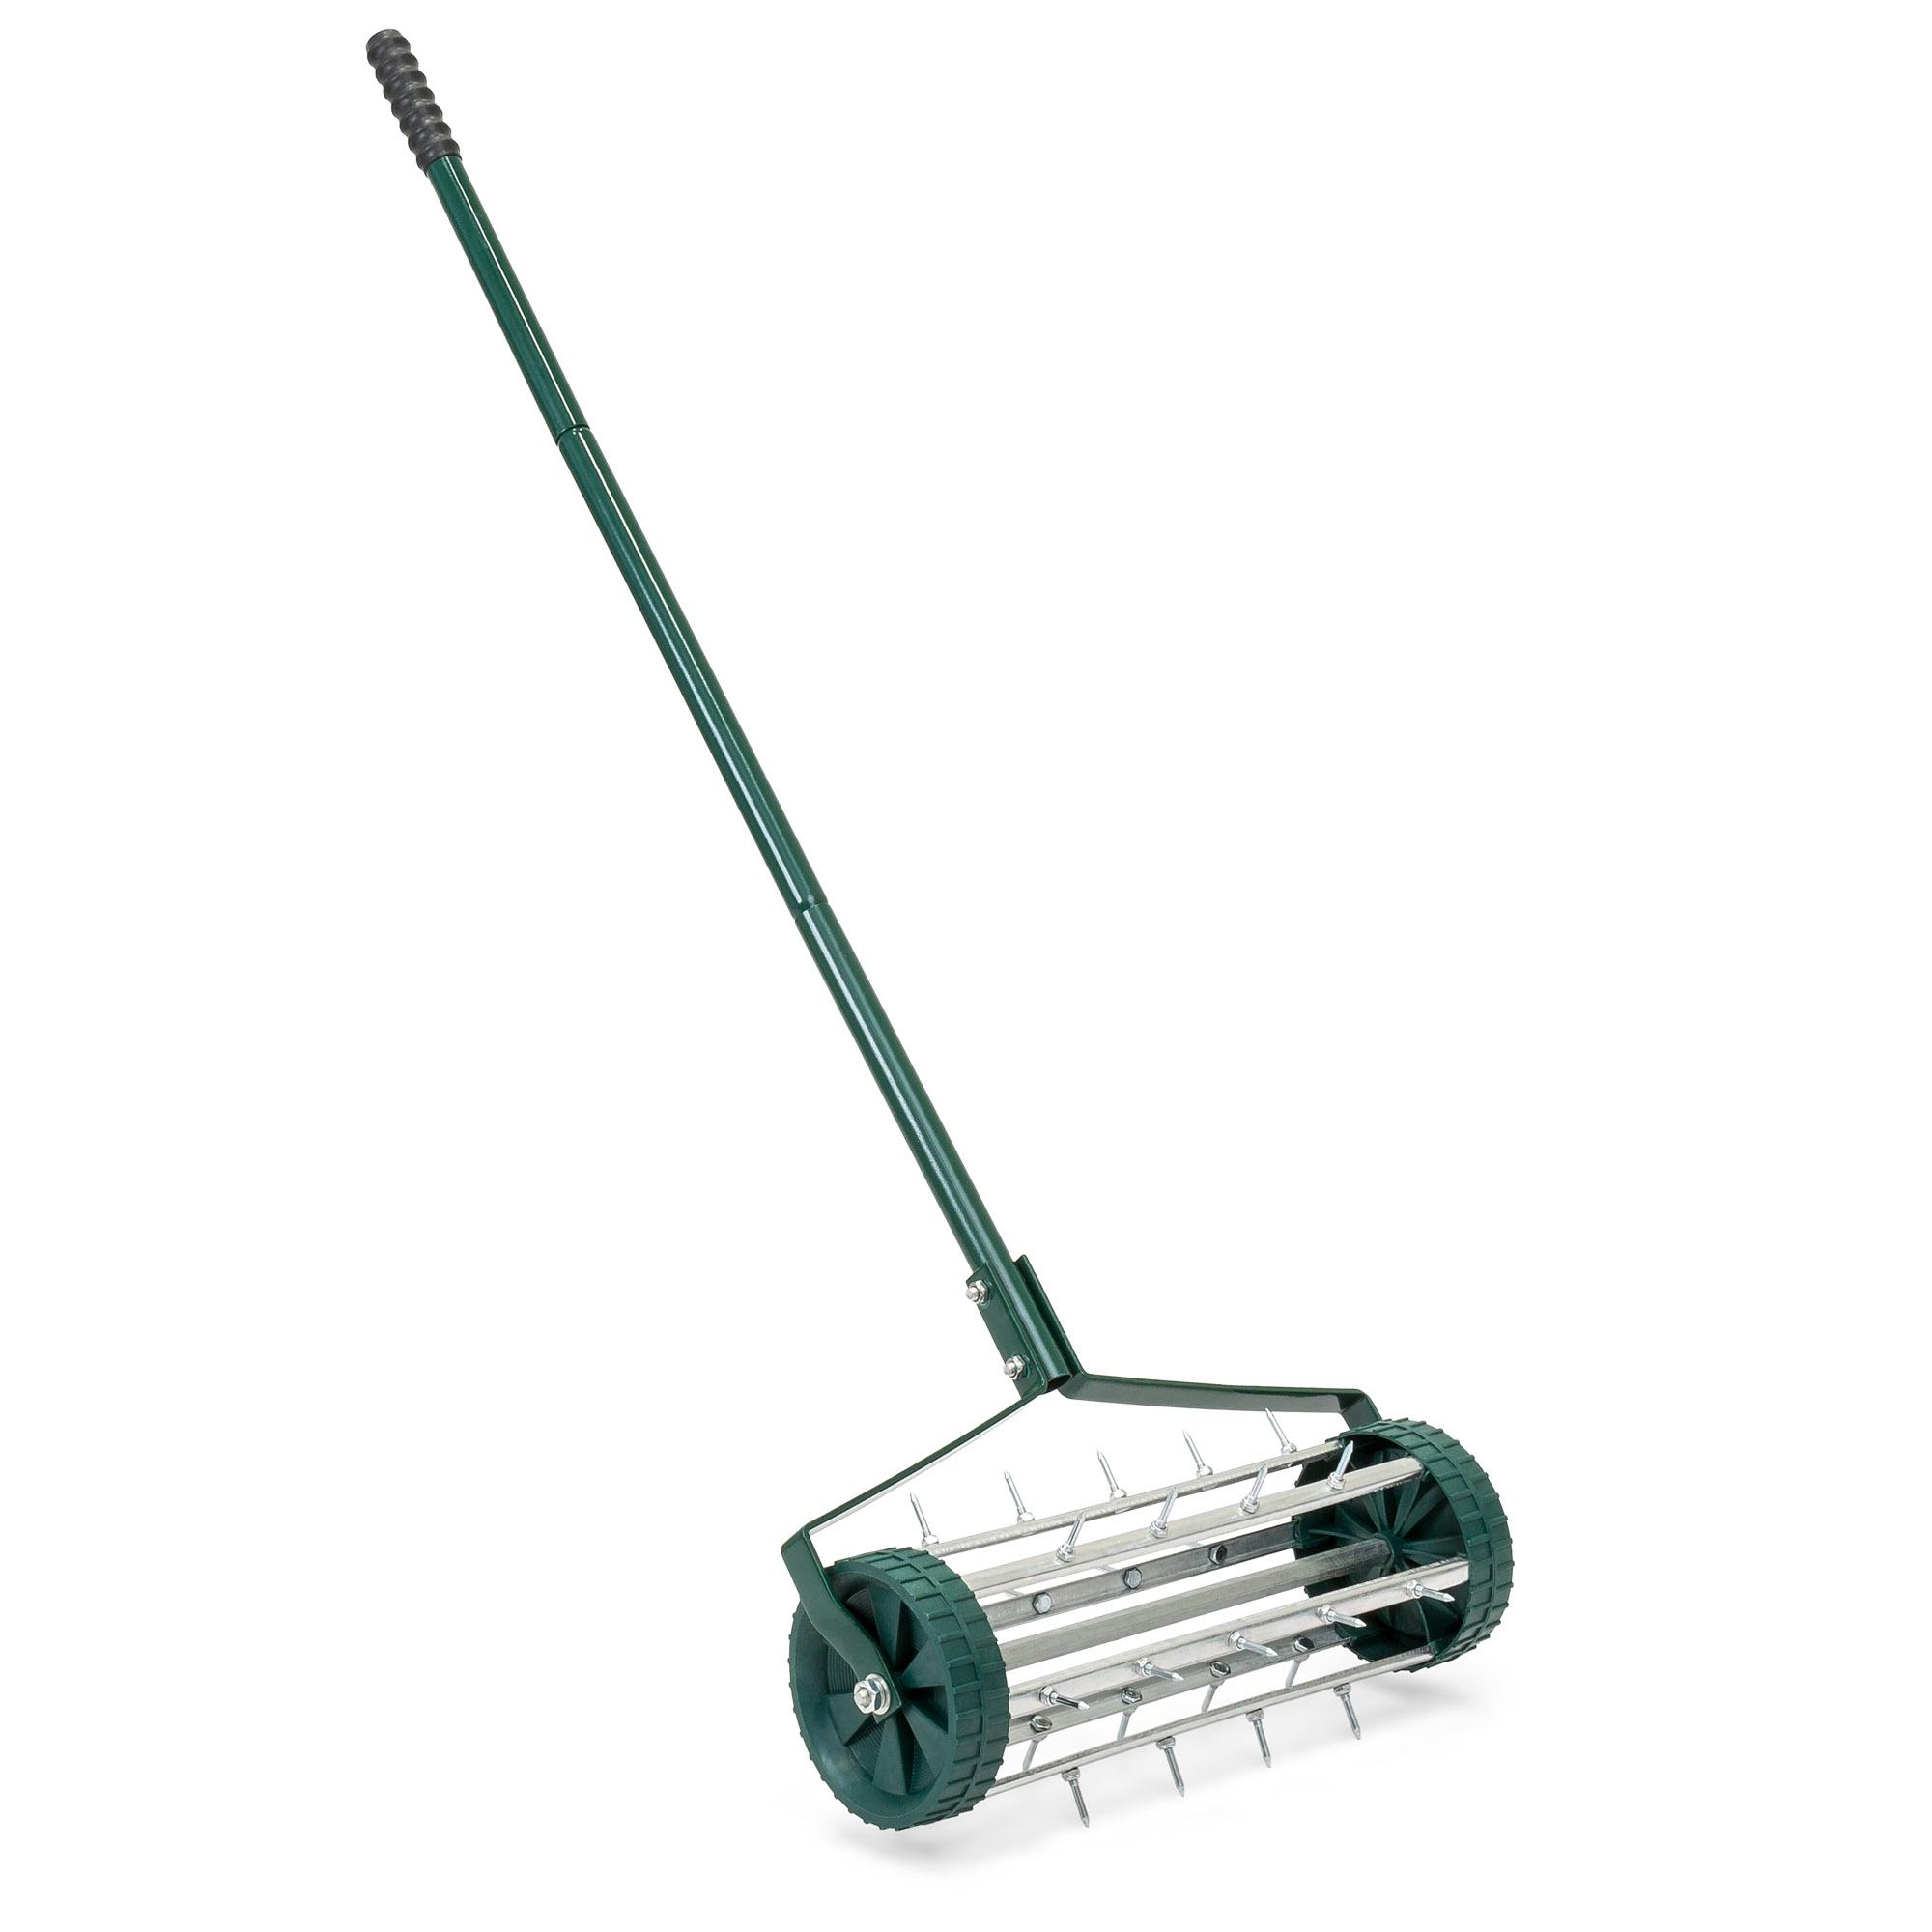 Bcp 18in Rolling Lawn Aerator Gardening Tool W Tine